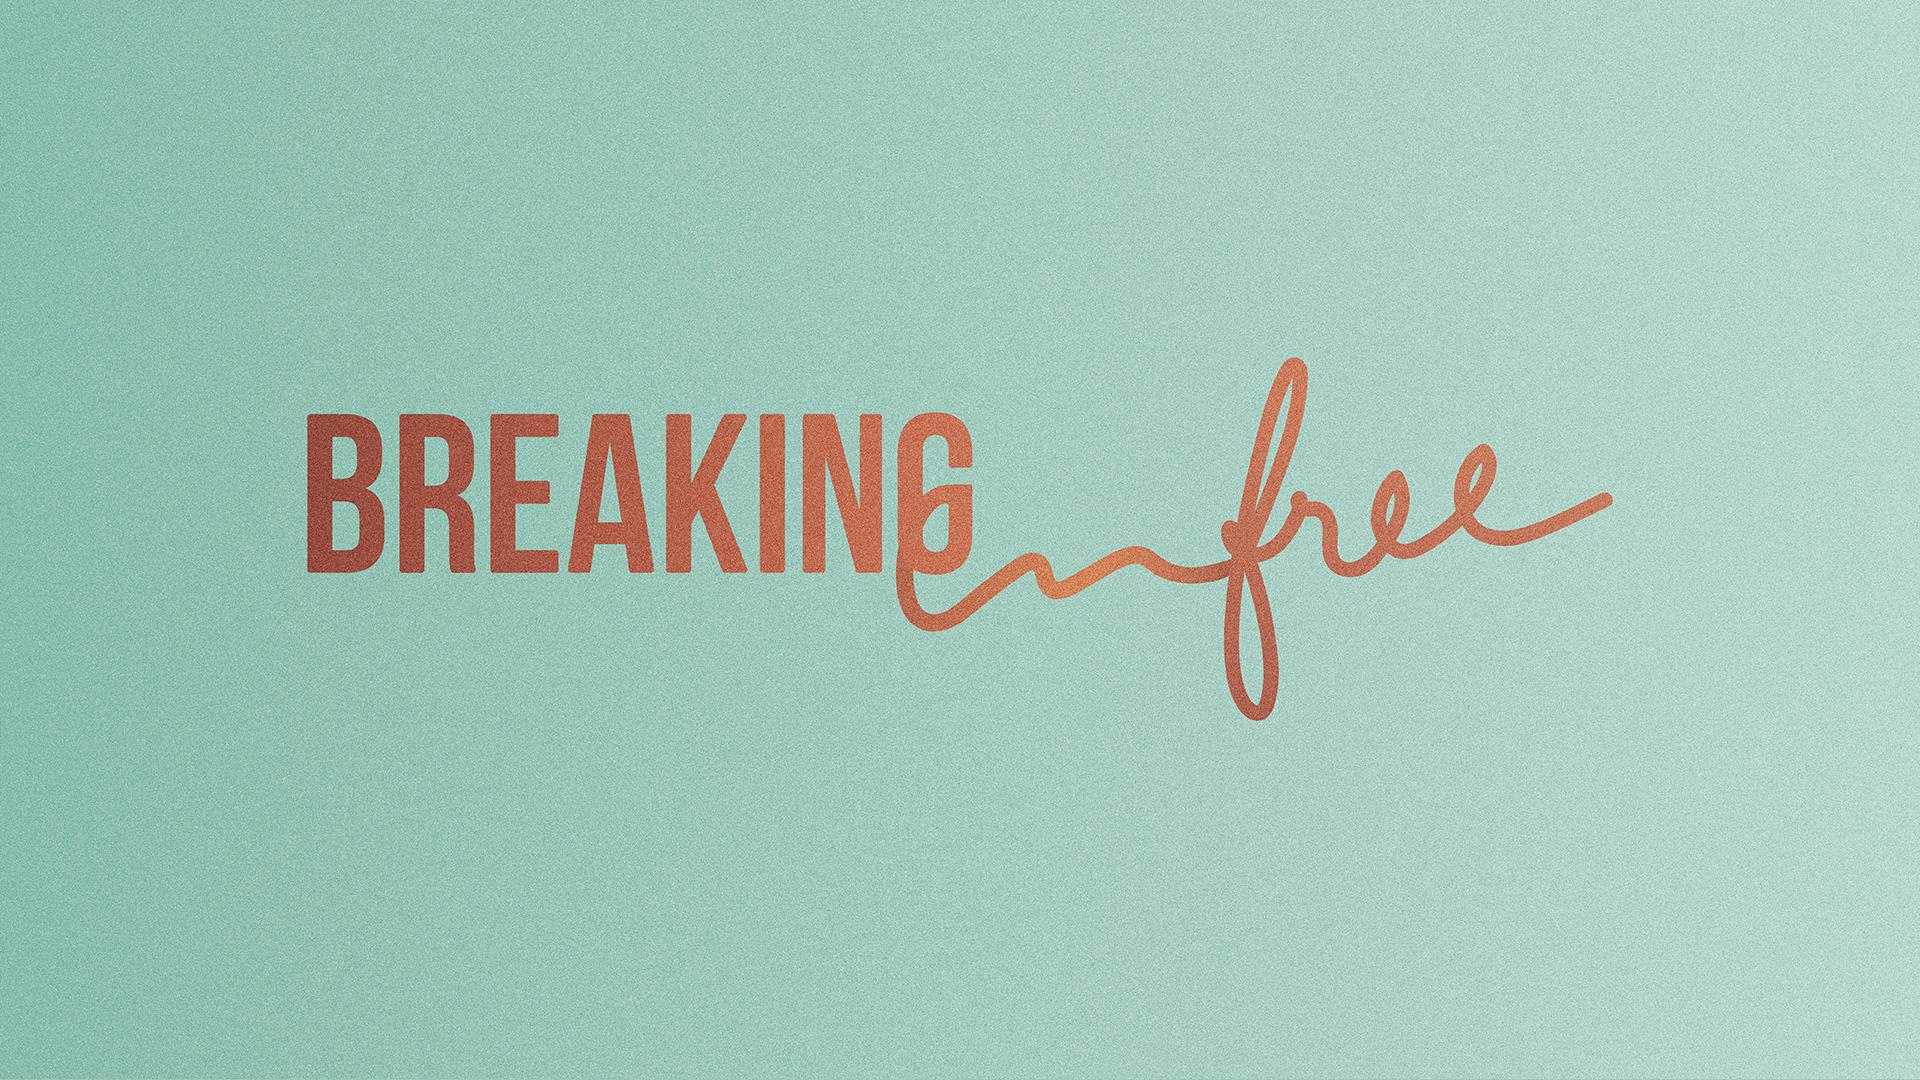 Breaking Free_Master-1920x1080.jpg